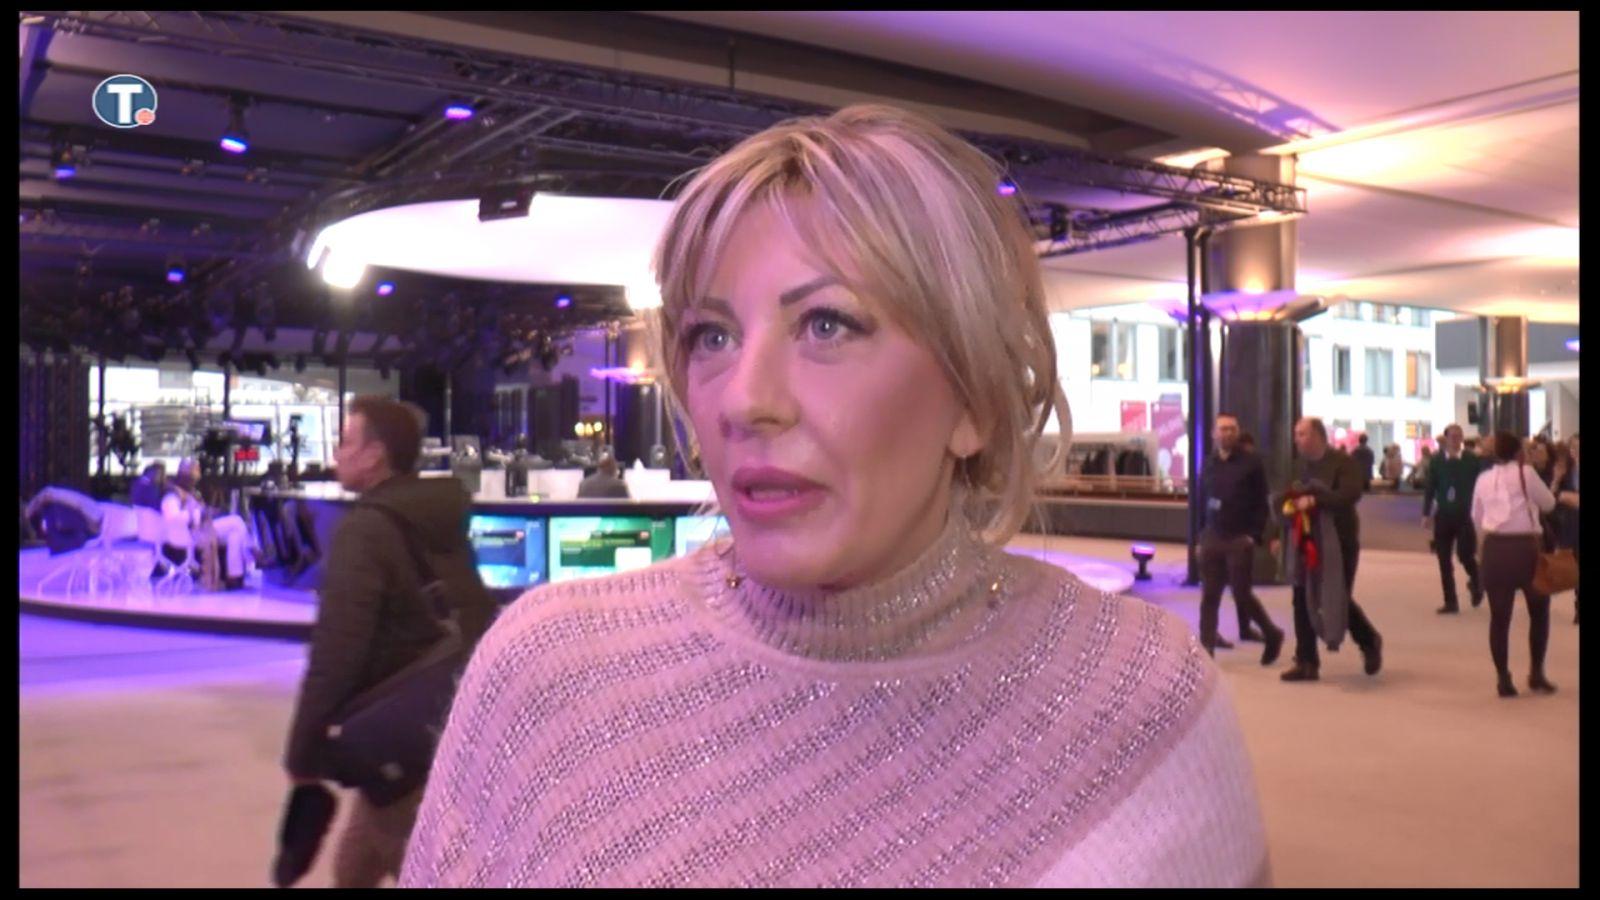 J. Joksimović: Nothing ground-breaking, we will analyse if there is something stimulative